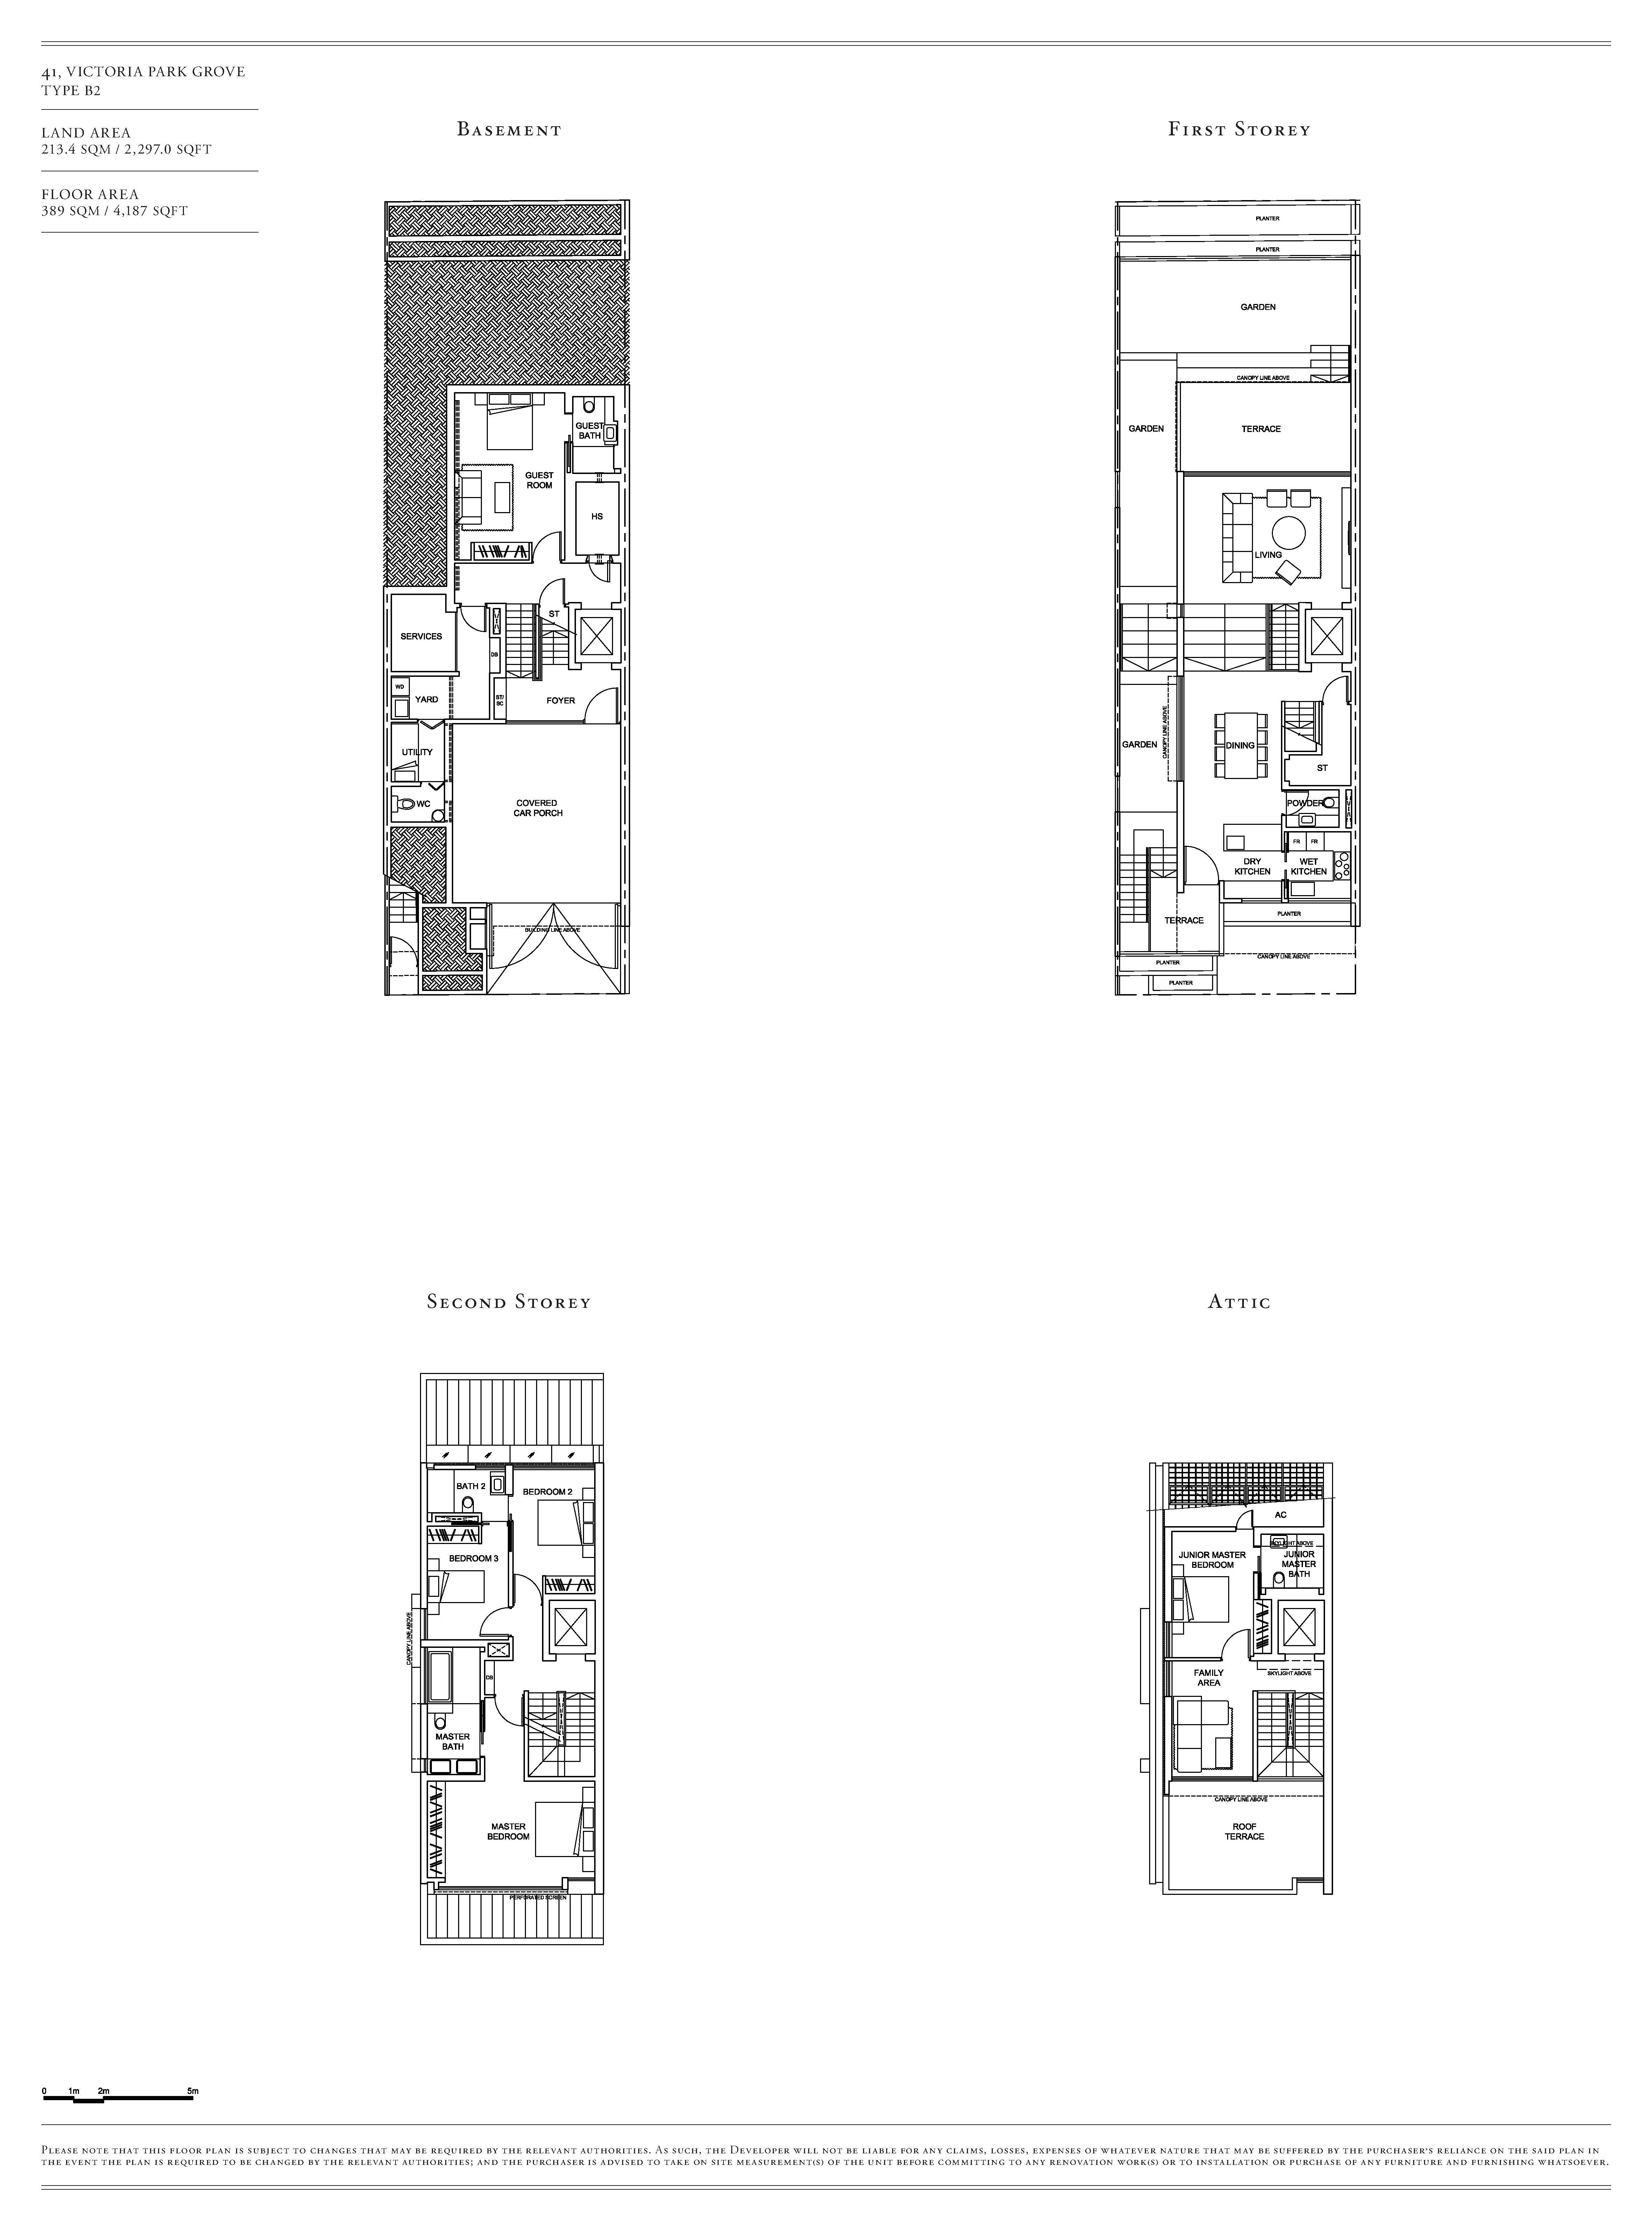 Victoria Park Villas House 41 Type B2 Floor Plans